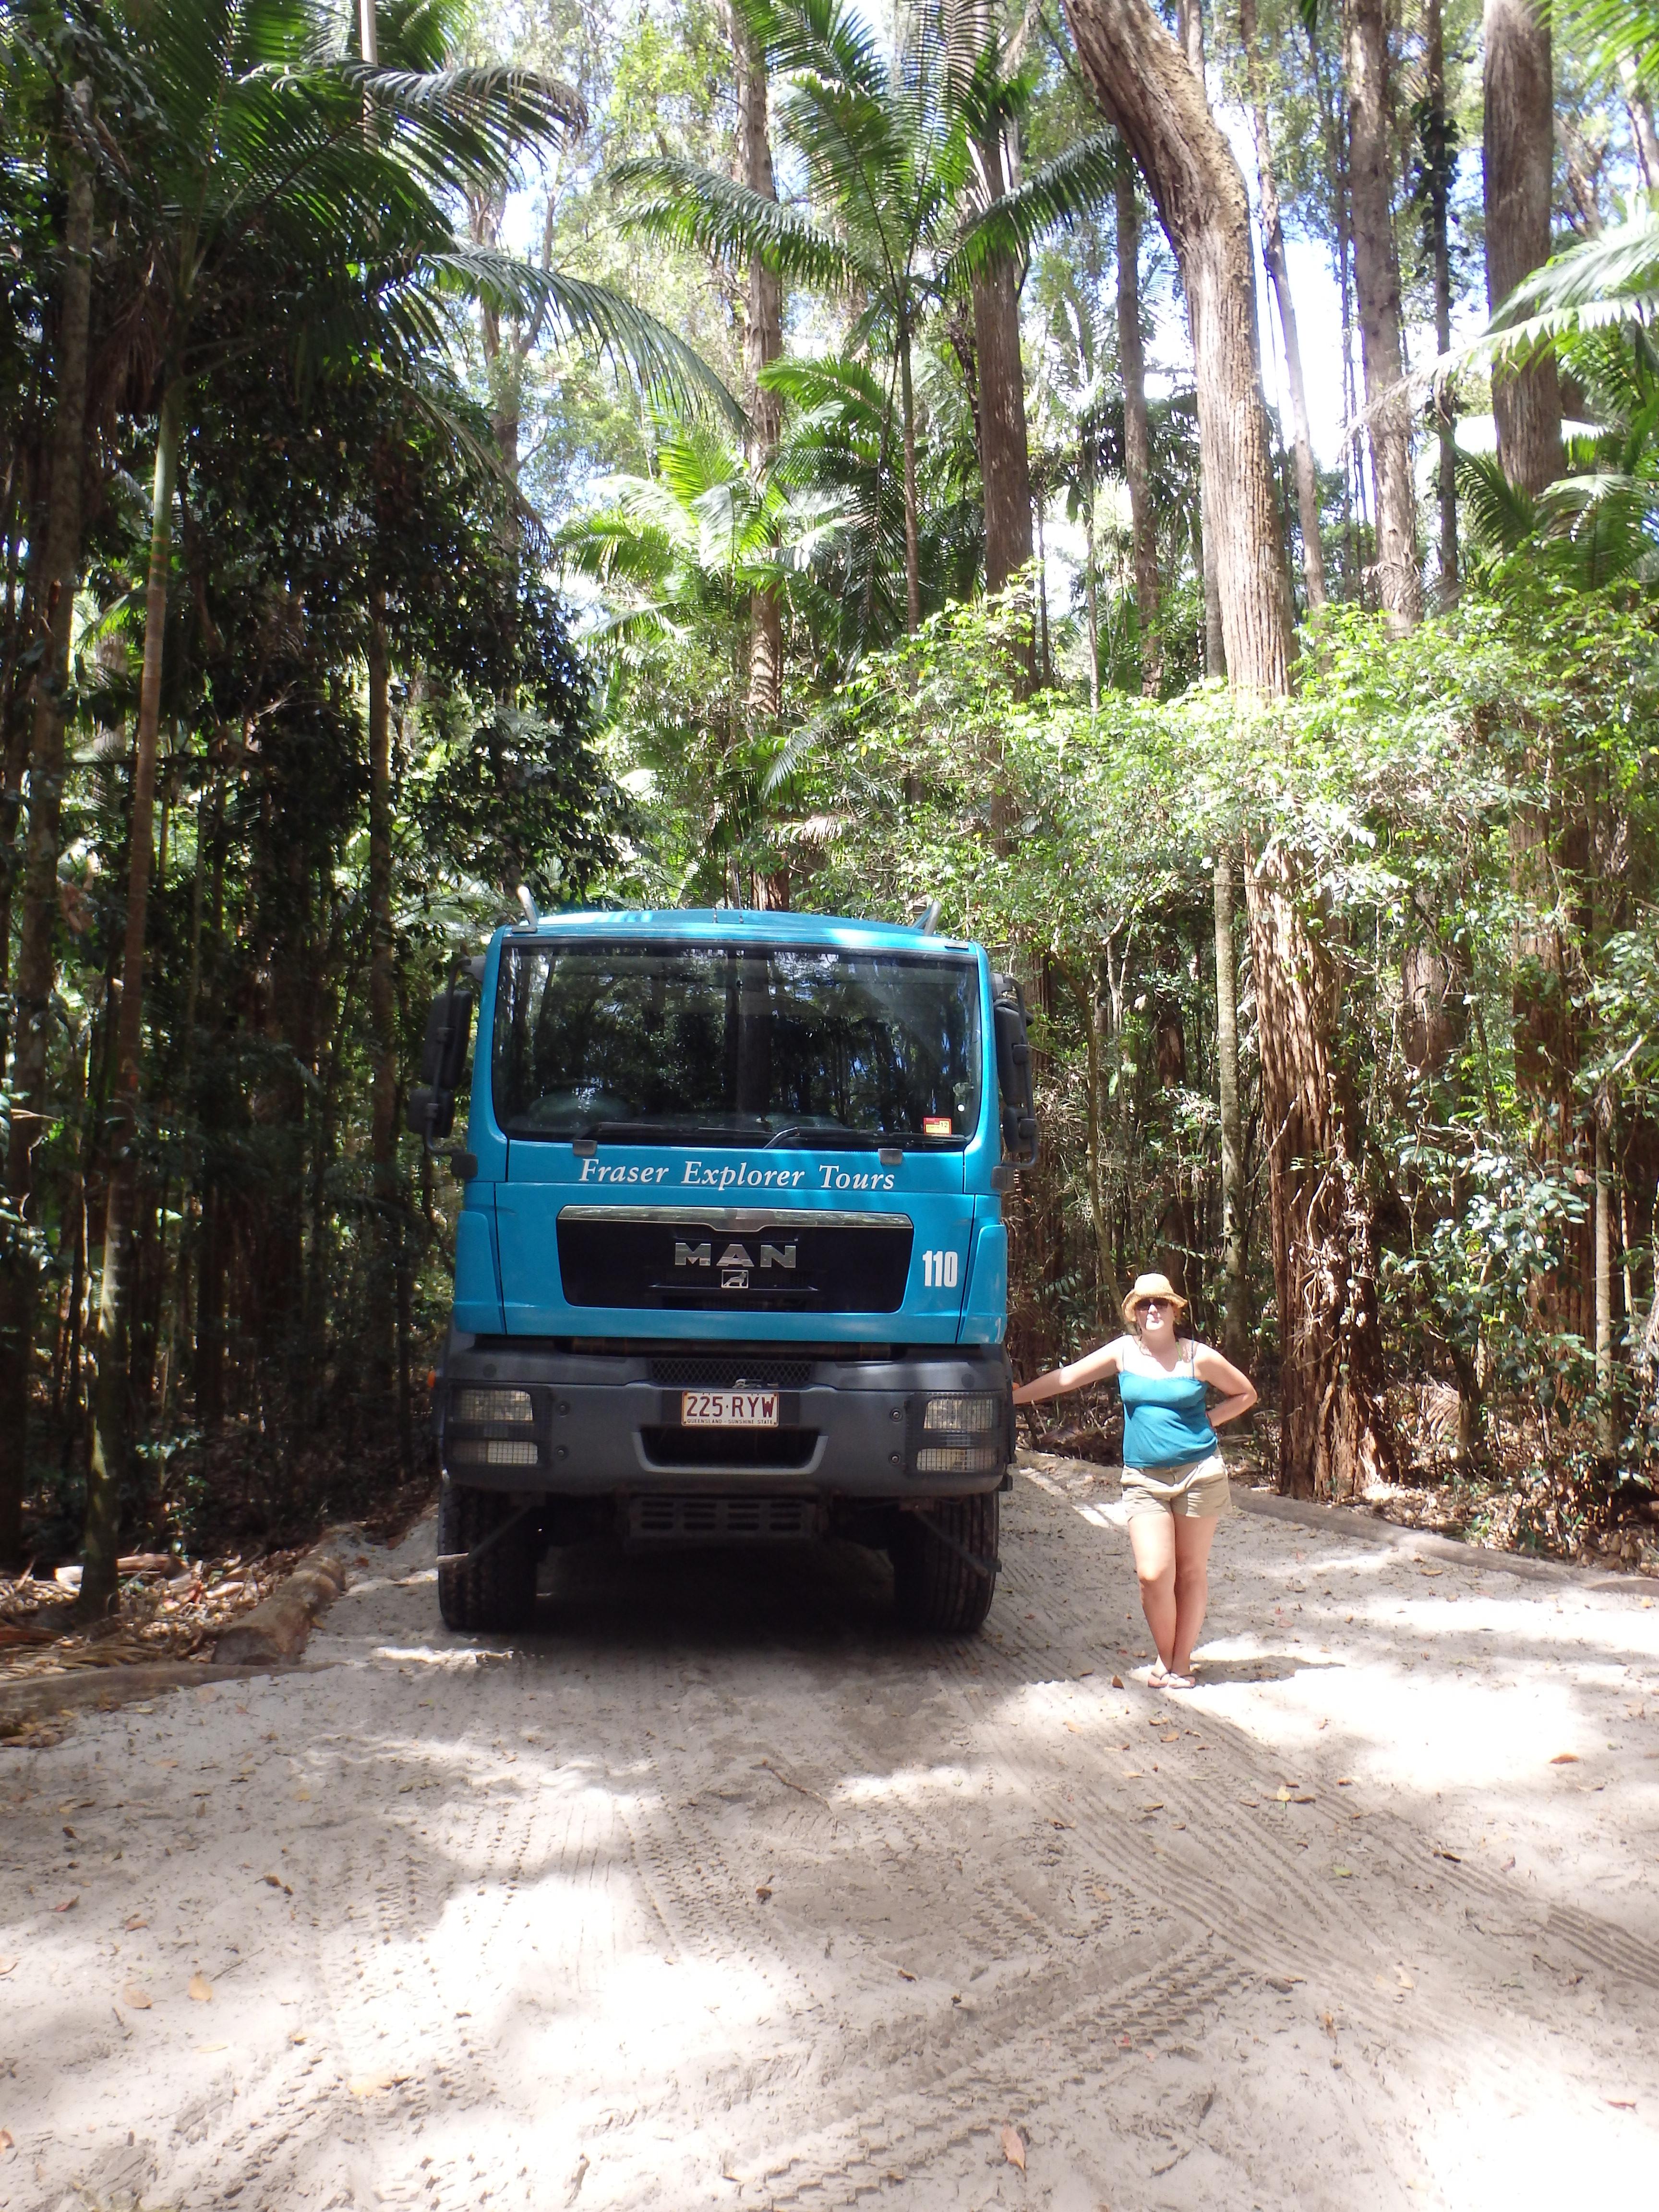 Davina naast grote jeep/truck/bus om rond te rijden op Fraser Island